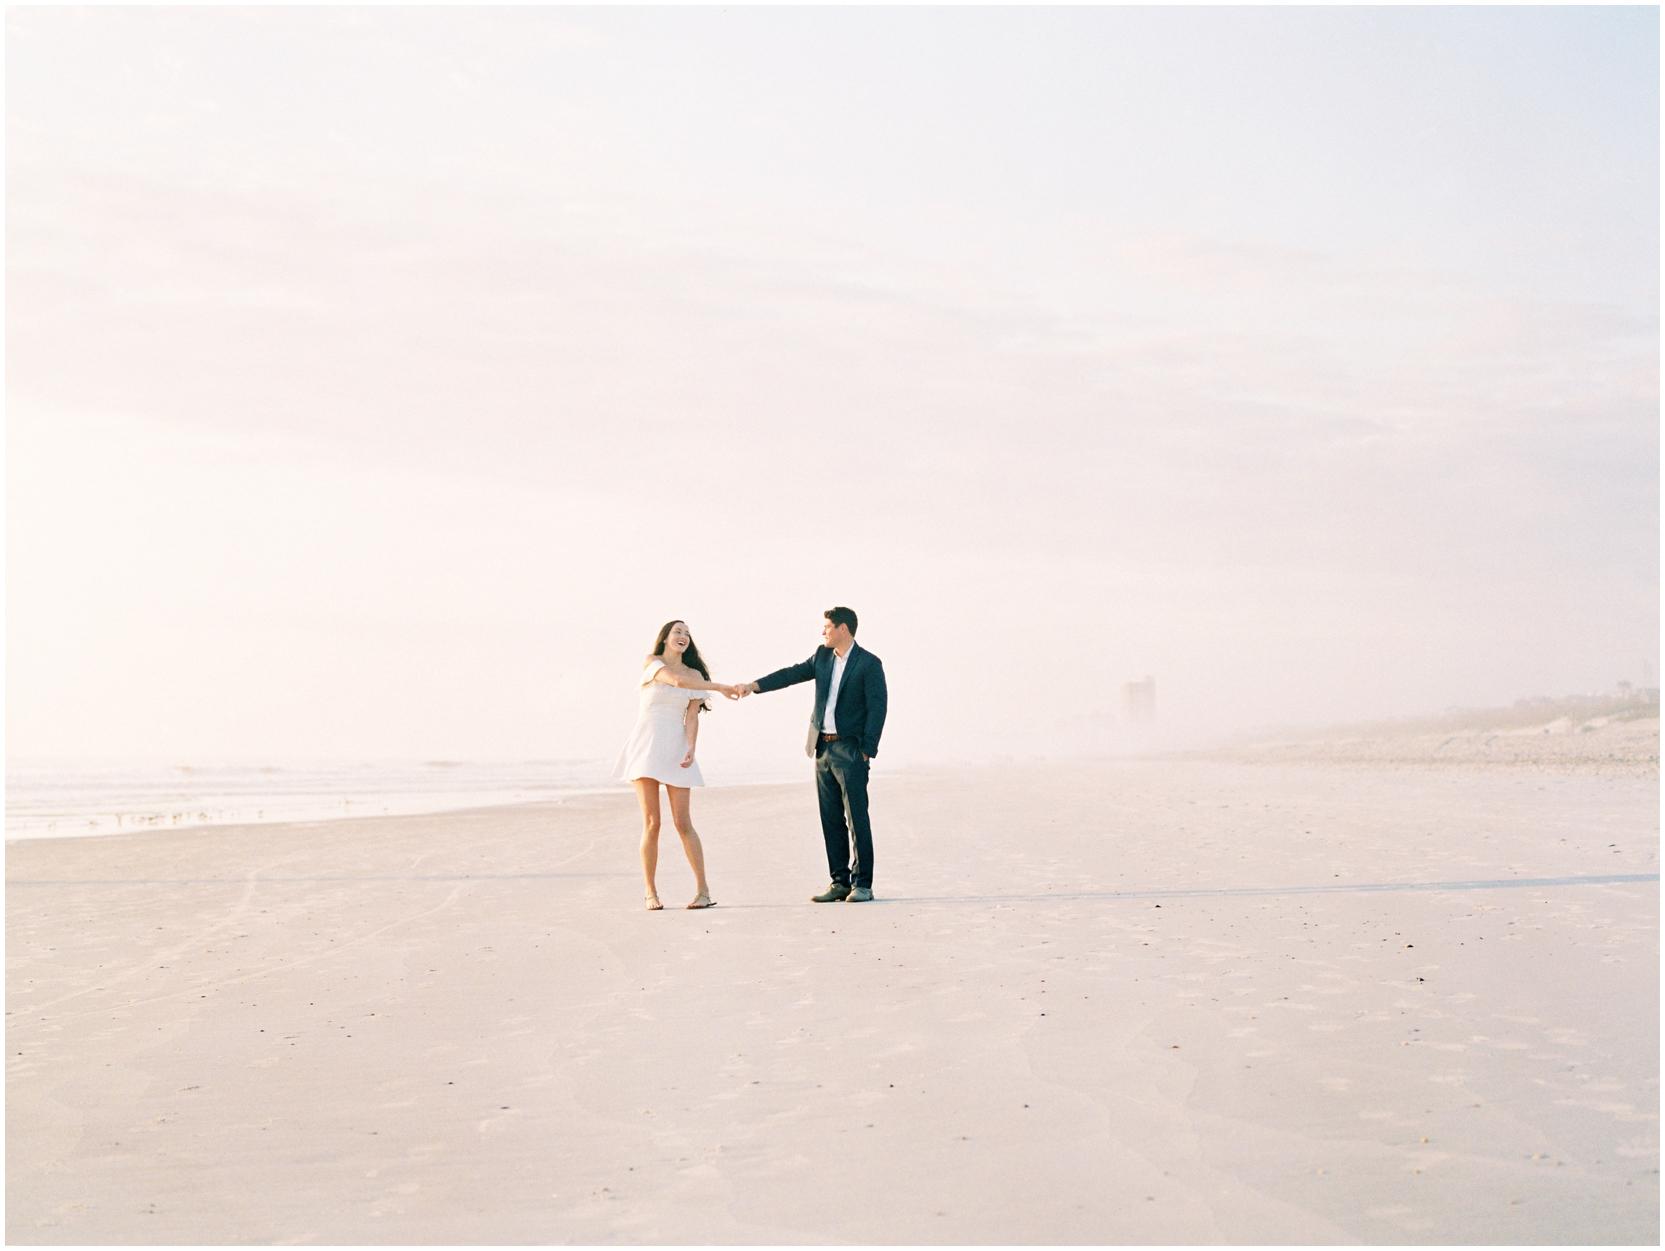 Lisa Silva Photography -Engagement Session at Neptune Beach, Florida- Jacksonville and North East Florida Fine Art Film Photographer_0008.jpg